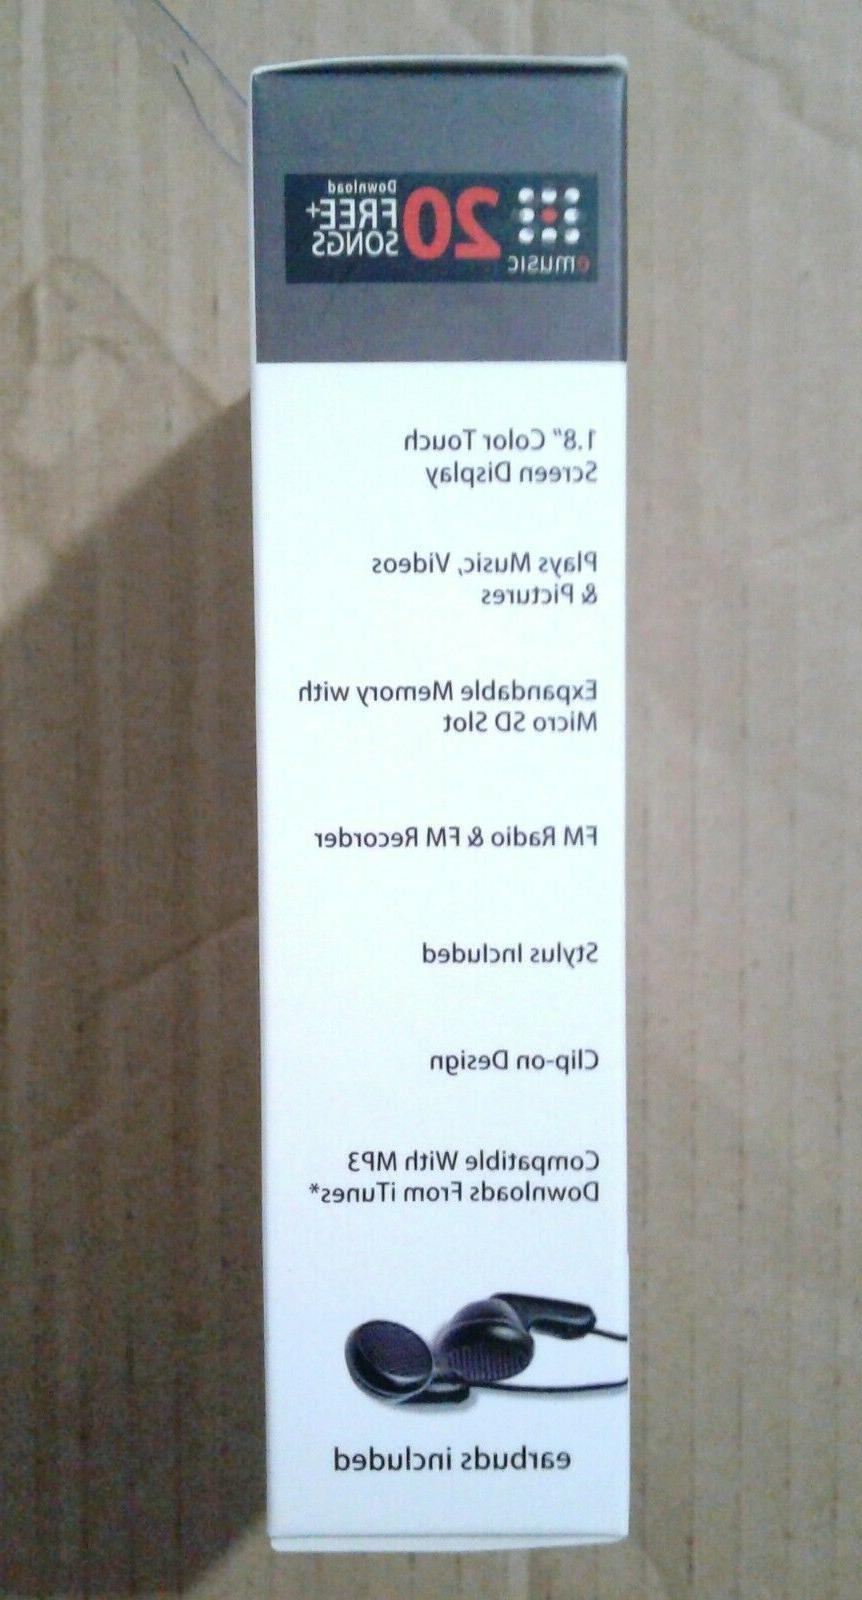 Eclipse 4GB MP3 Audio -